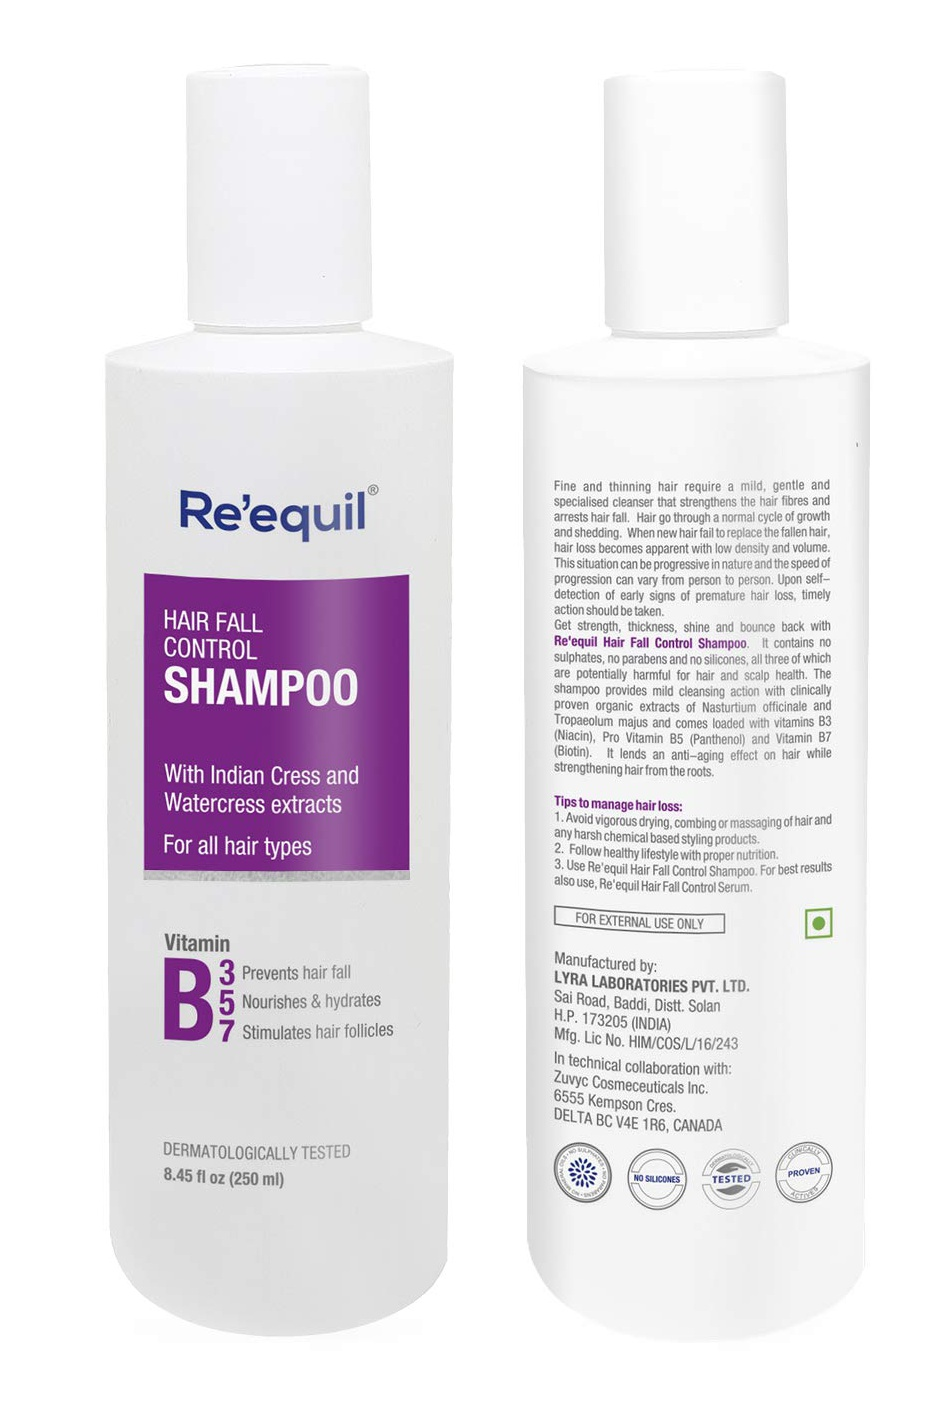 Re'equil Hair Fall Control Shampoo